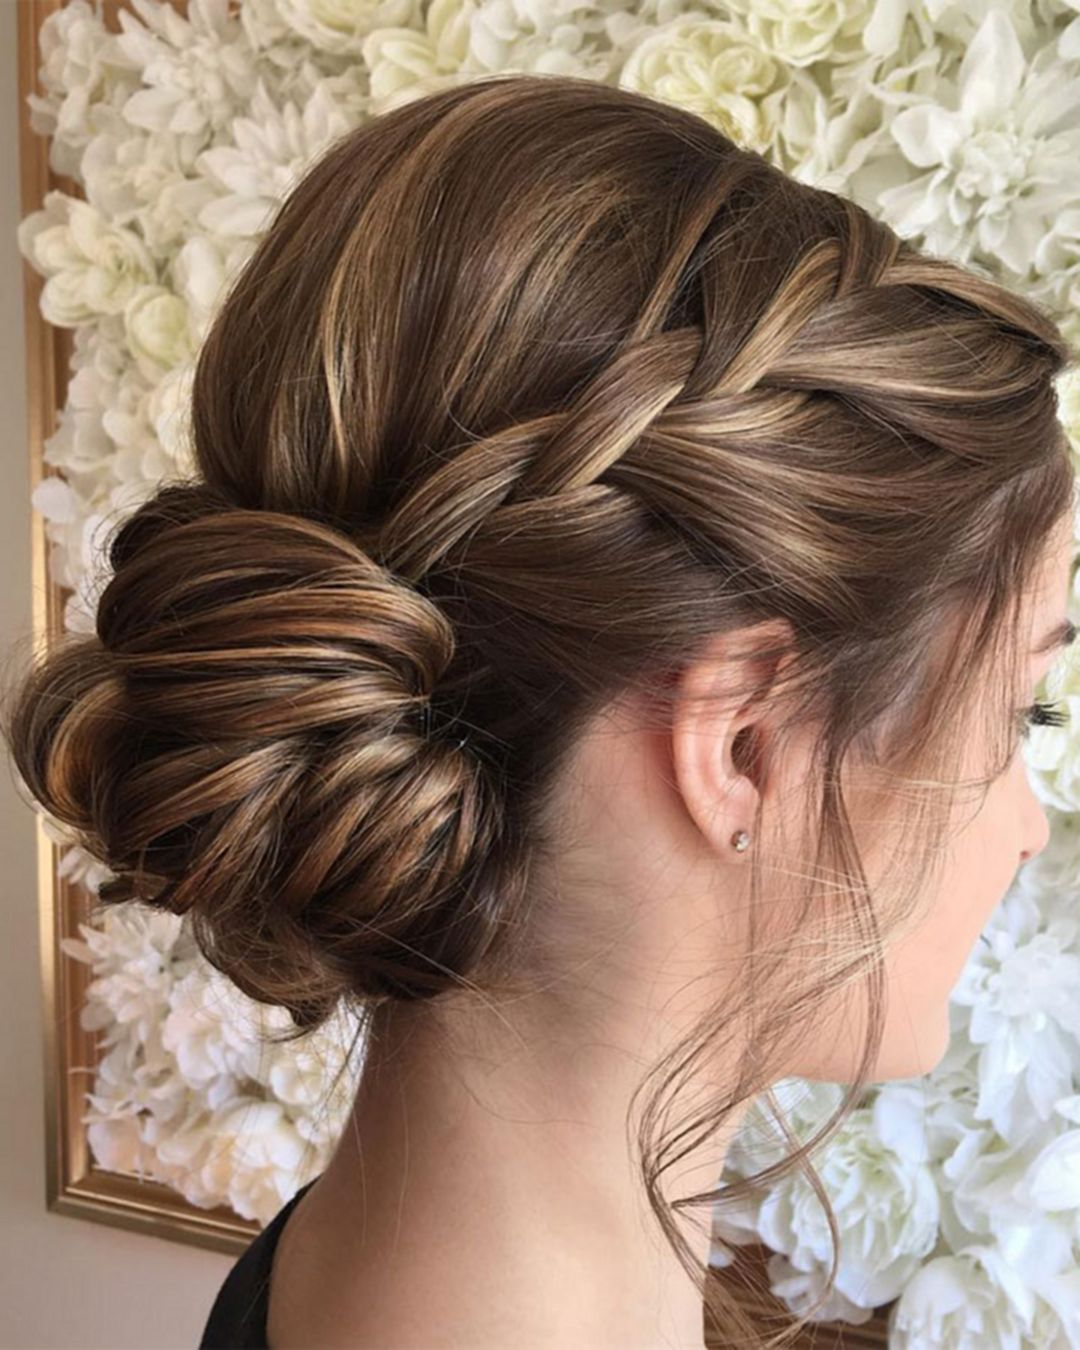 10+ Wonderful Bridesmaid Updo Hairstyles Braided